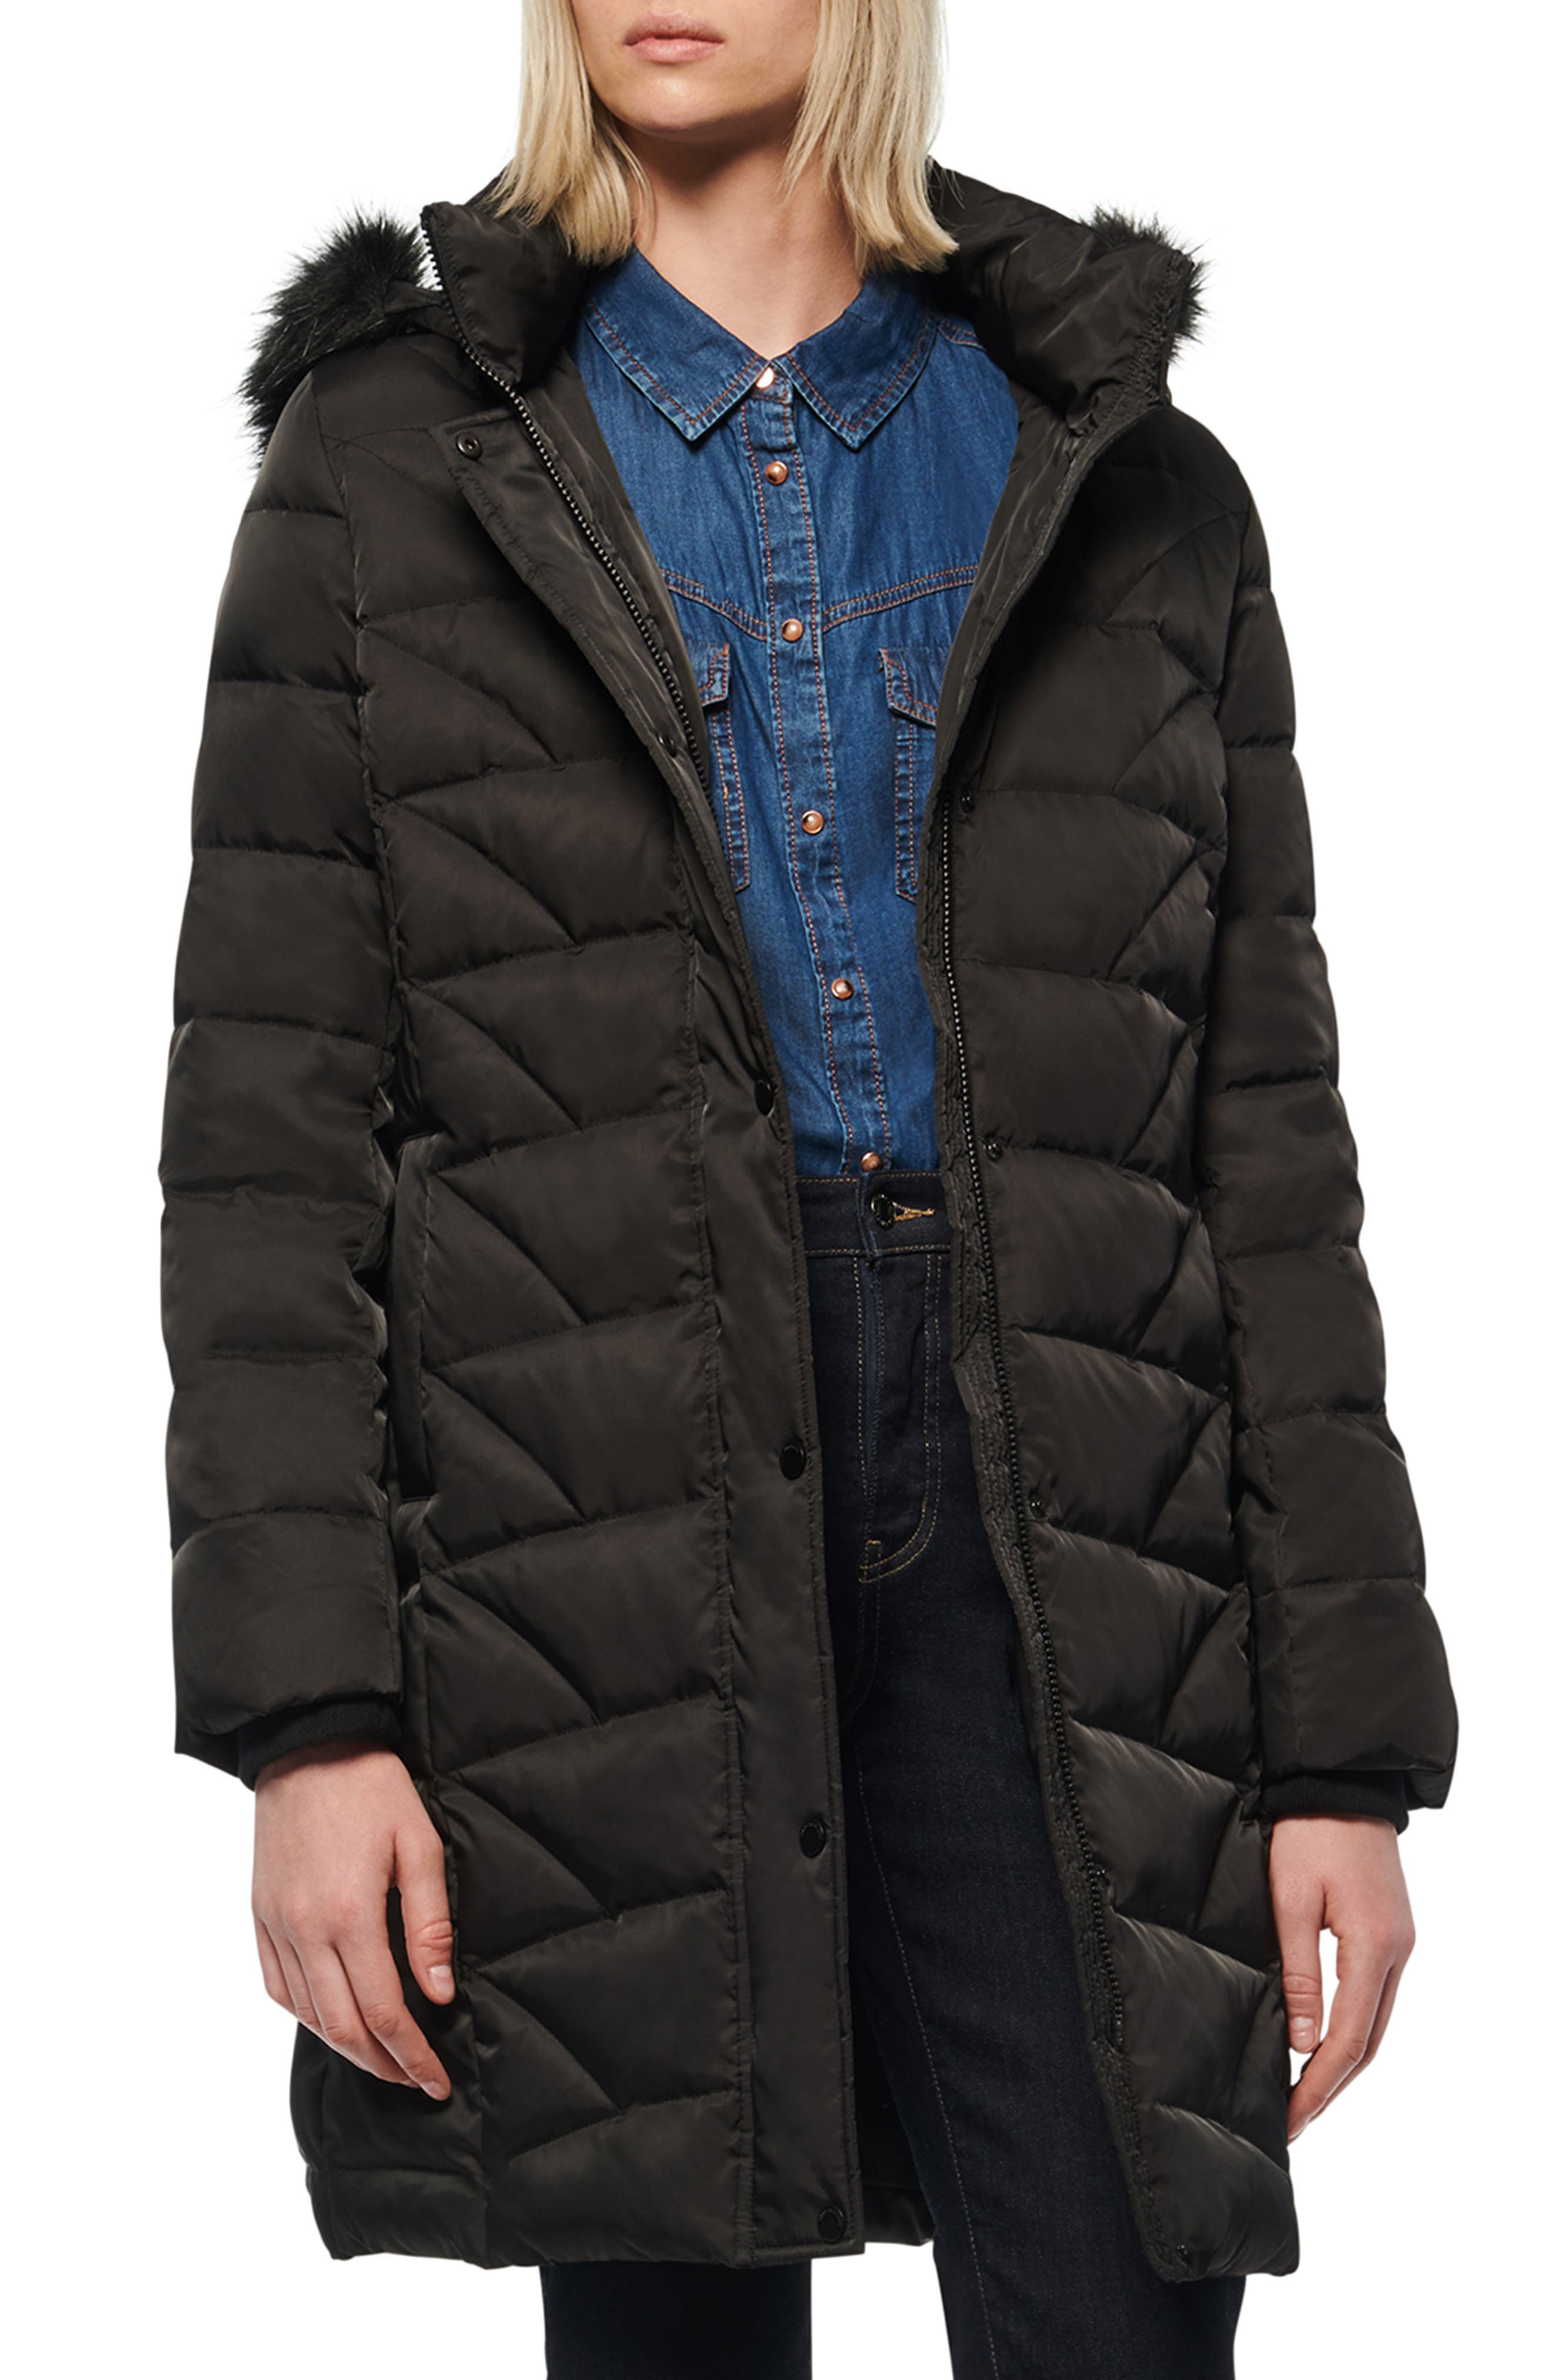 New Look  Black Faux Fur Collar Puffer Jacket Coat 8-18